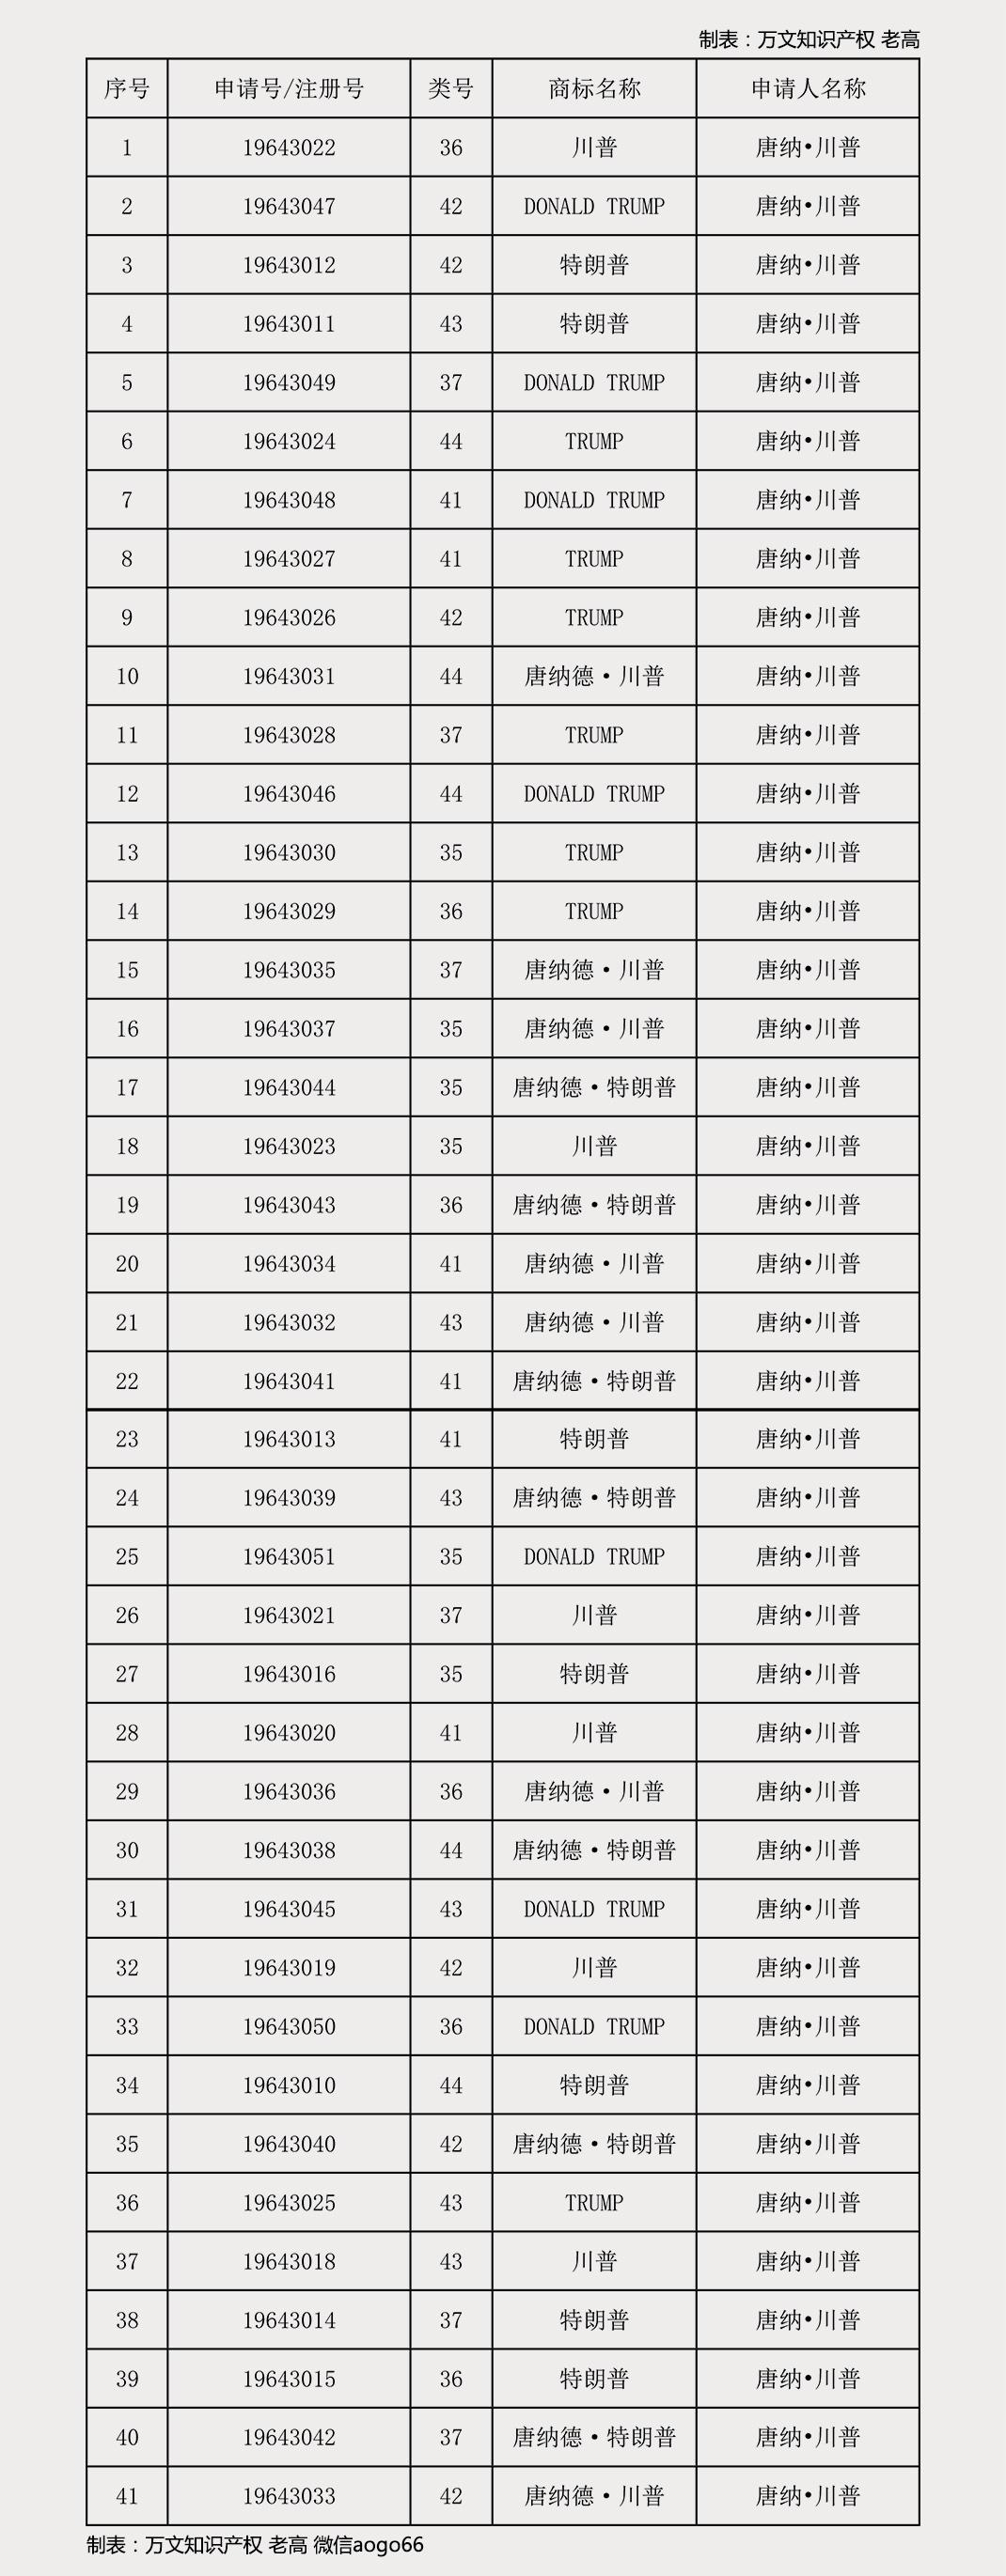 DONALDTRUMP 唐纳川普在中国注册商标